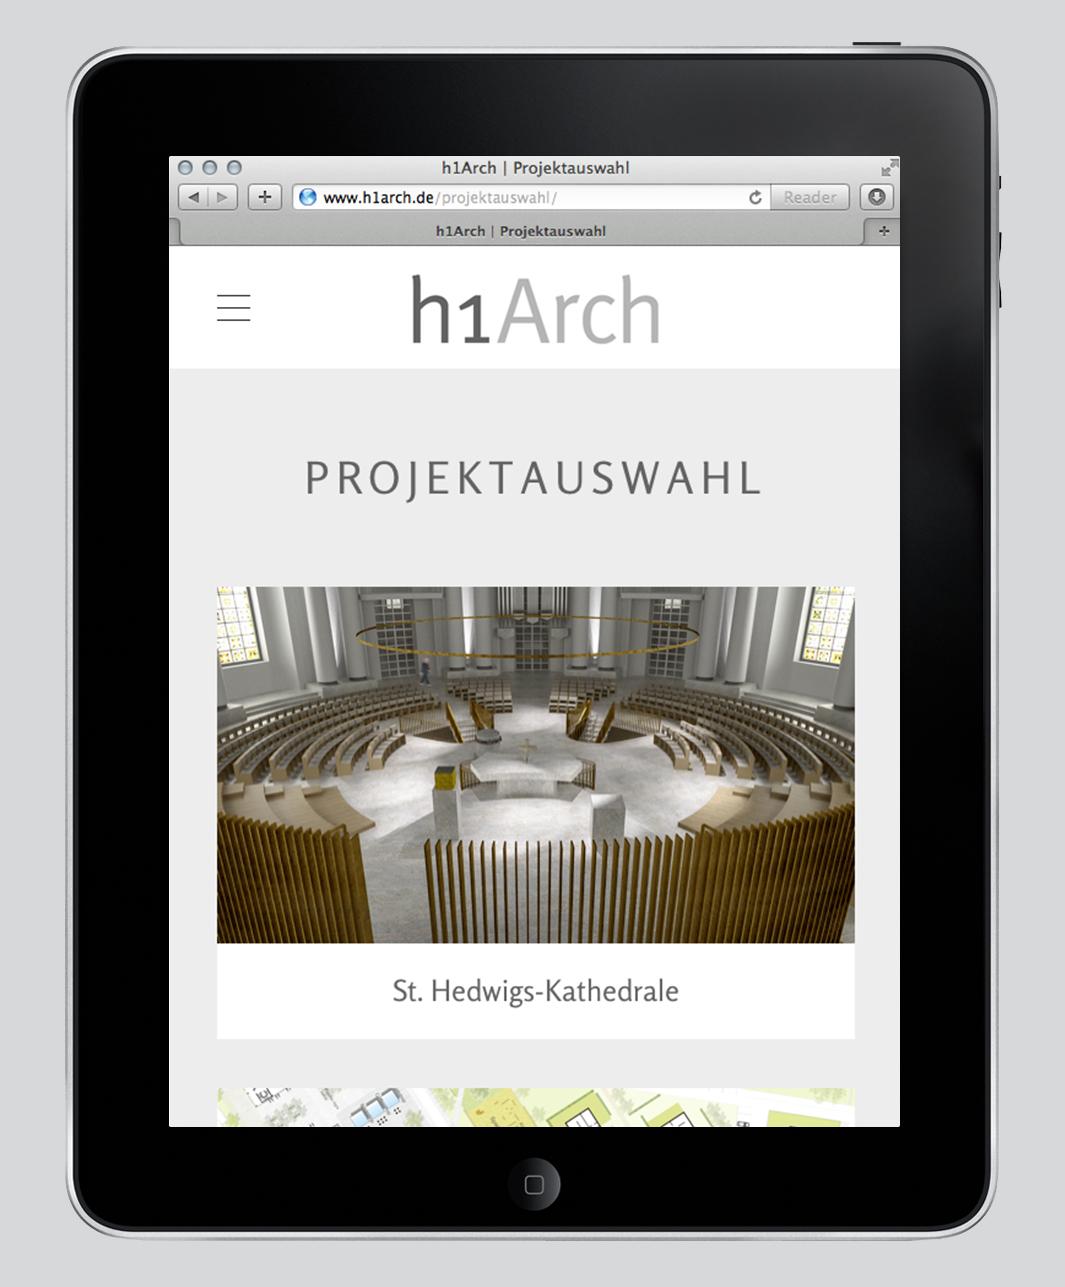 h1Arch_02.jpg